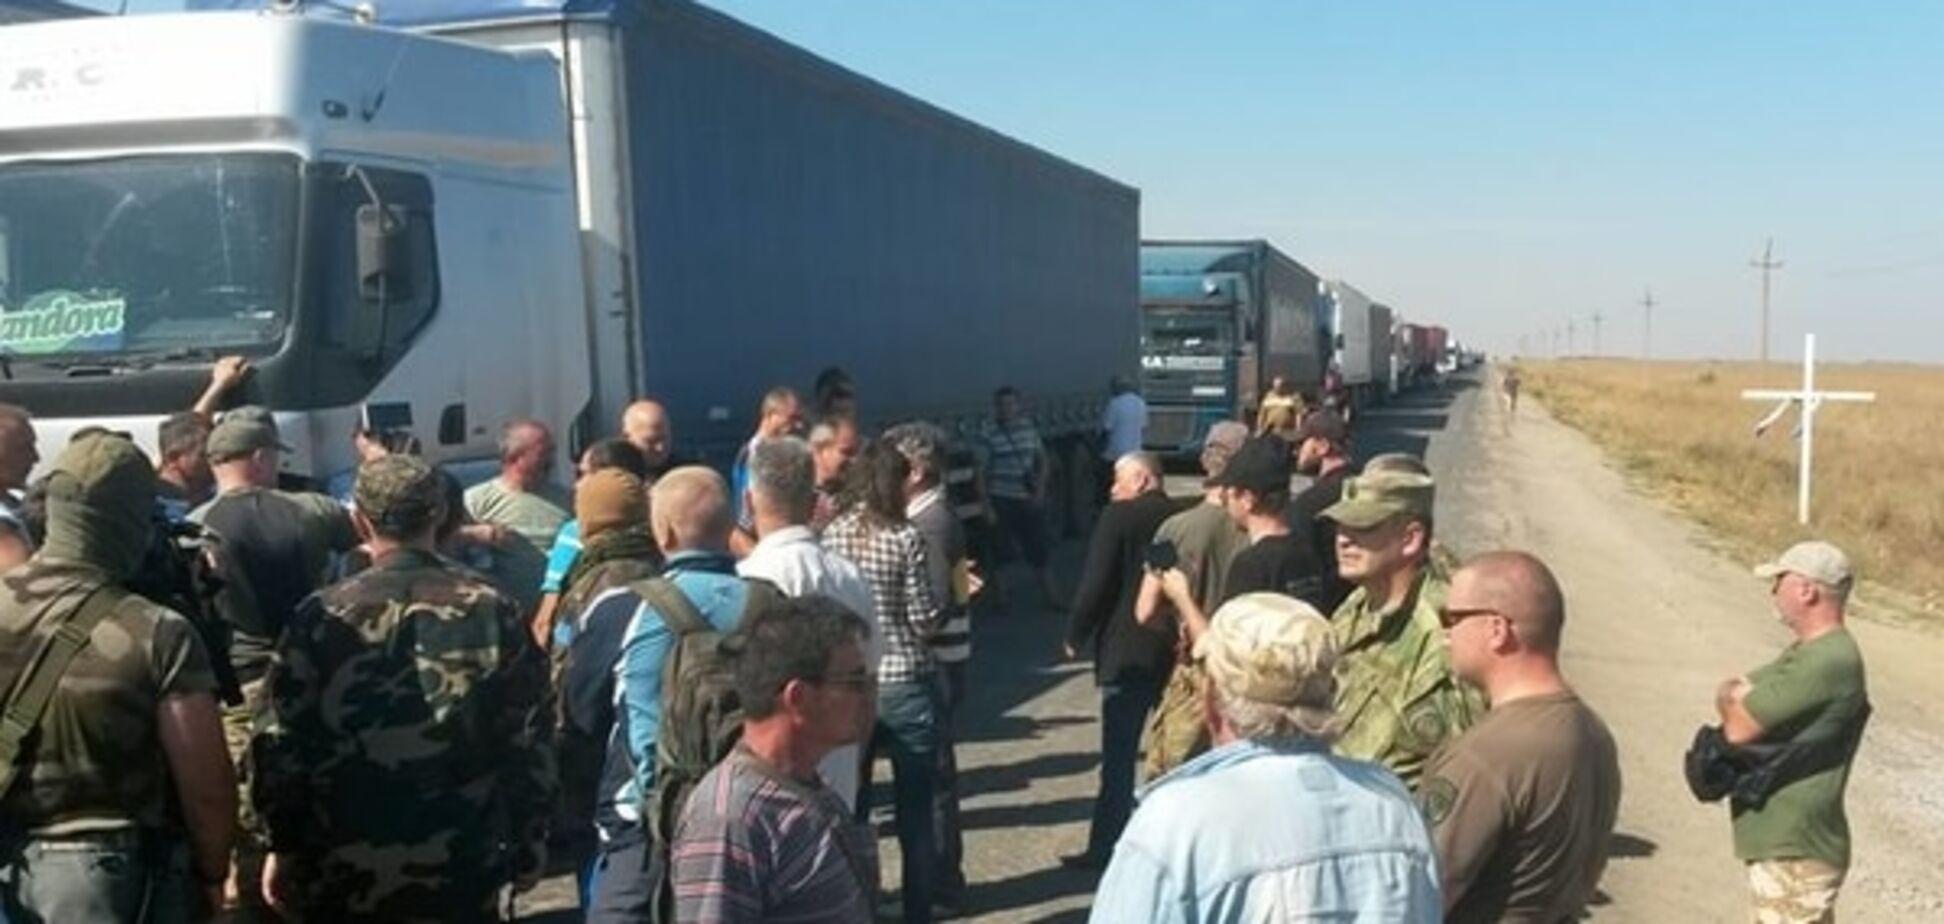 Блокада Крыма: на КПП 'застряли' 317 'озверевших' грузовиков. Опубликованы фото